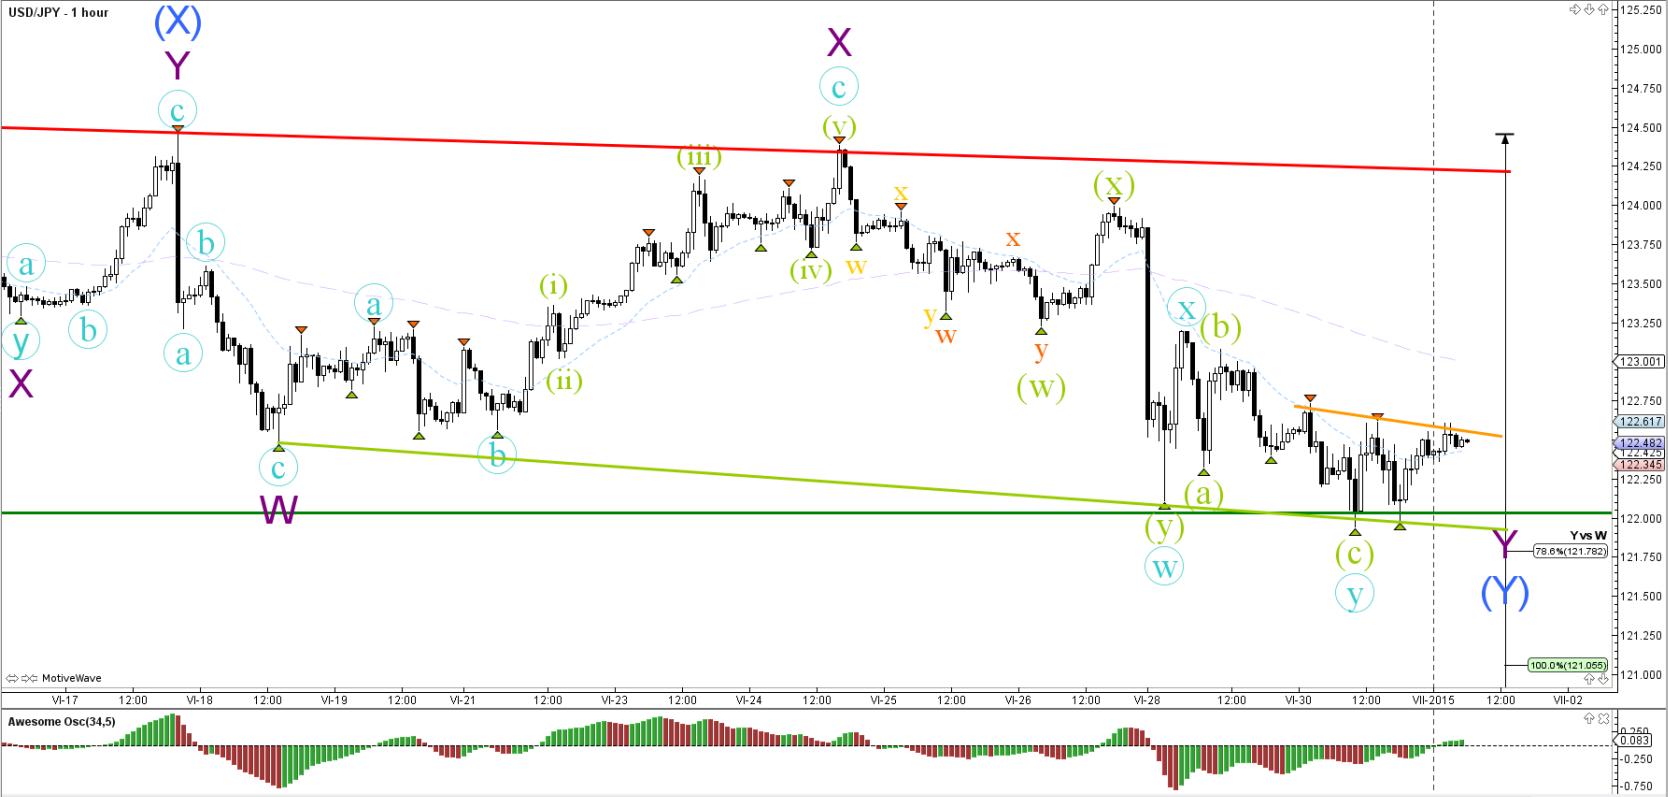 R-breaker trading system